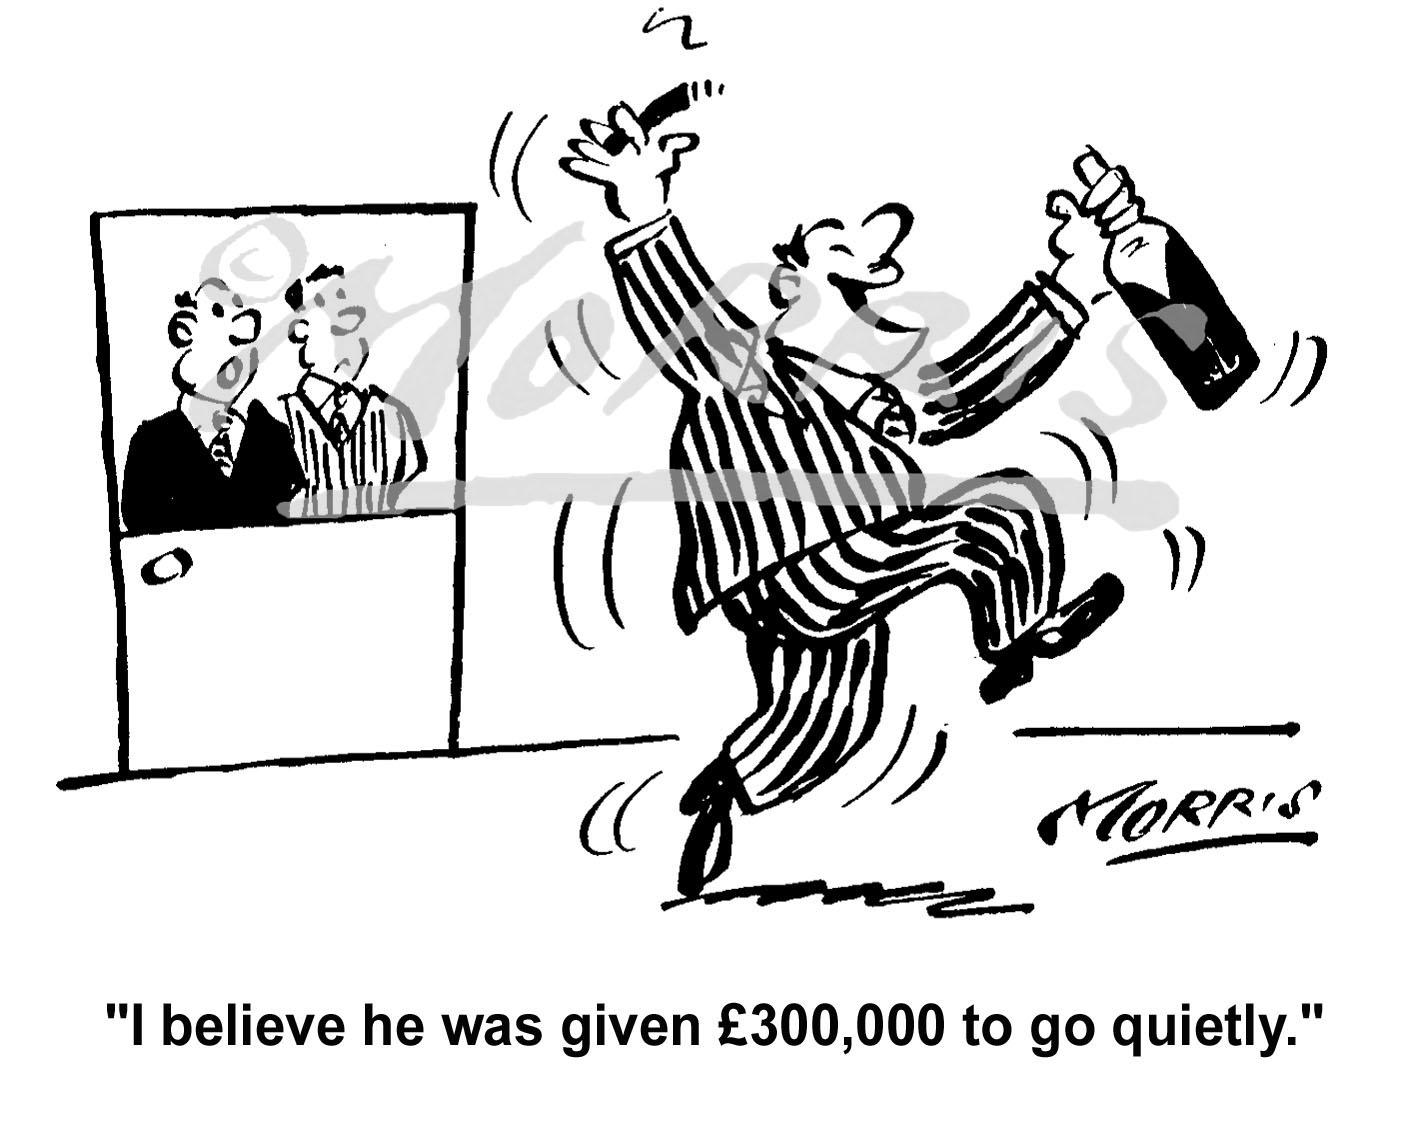 Chairman redundancy money cartoon Ref: 1473bw